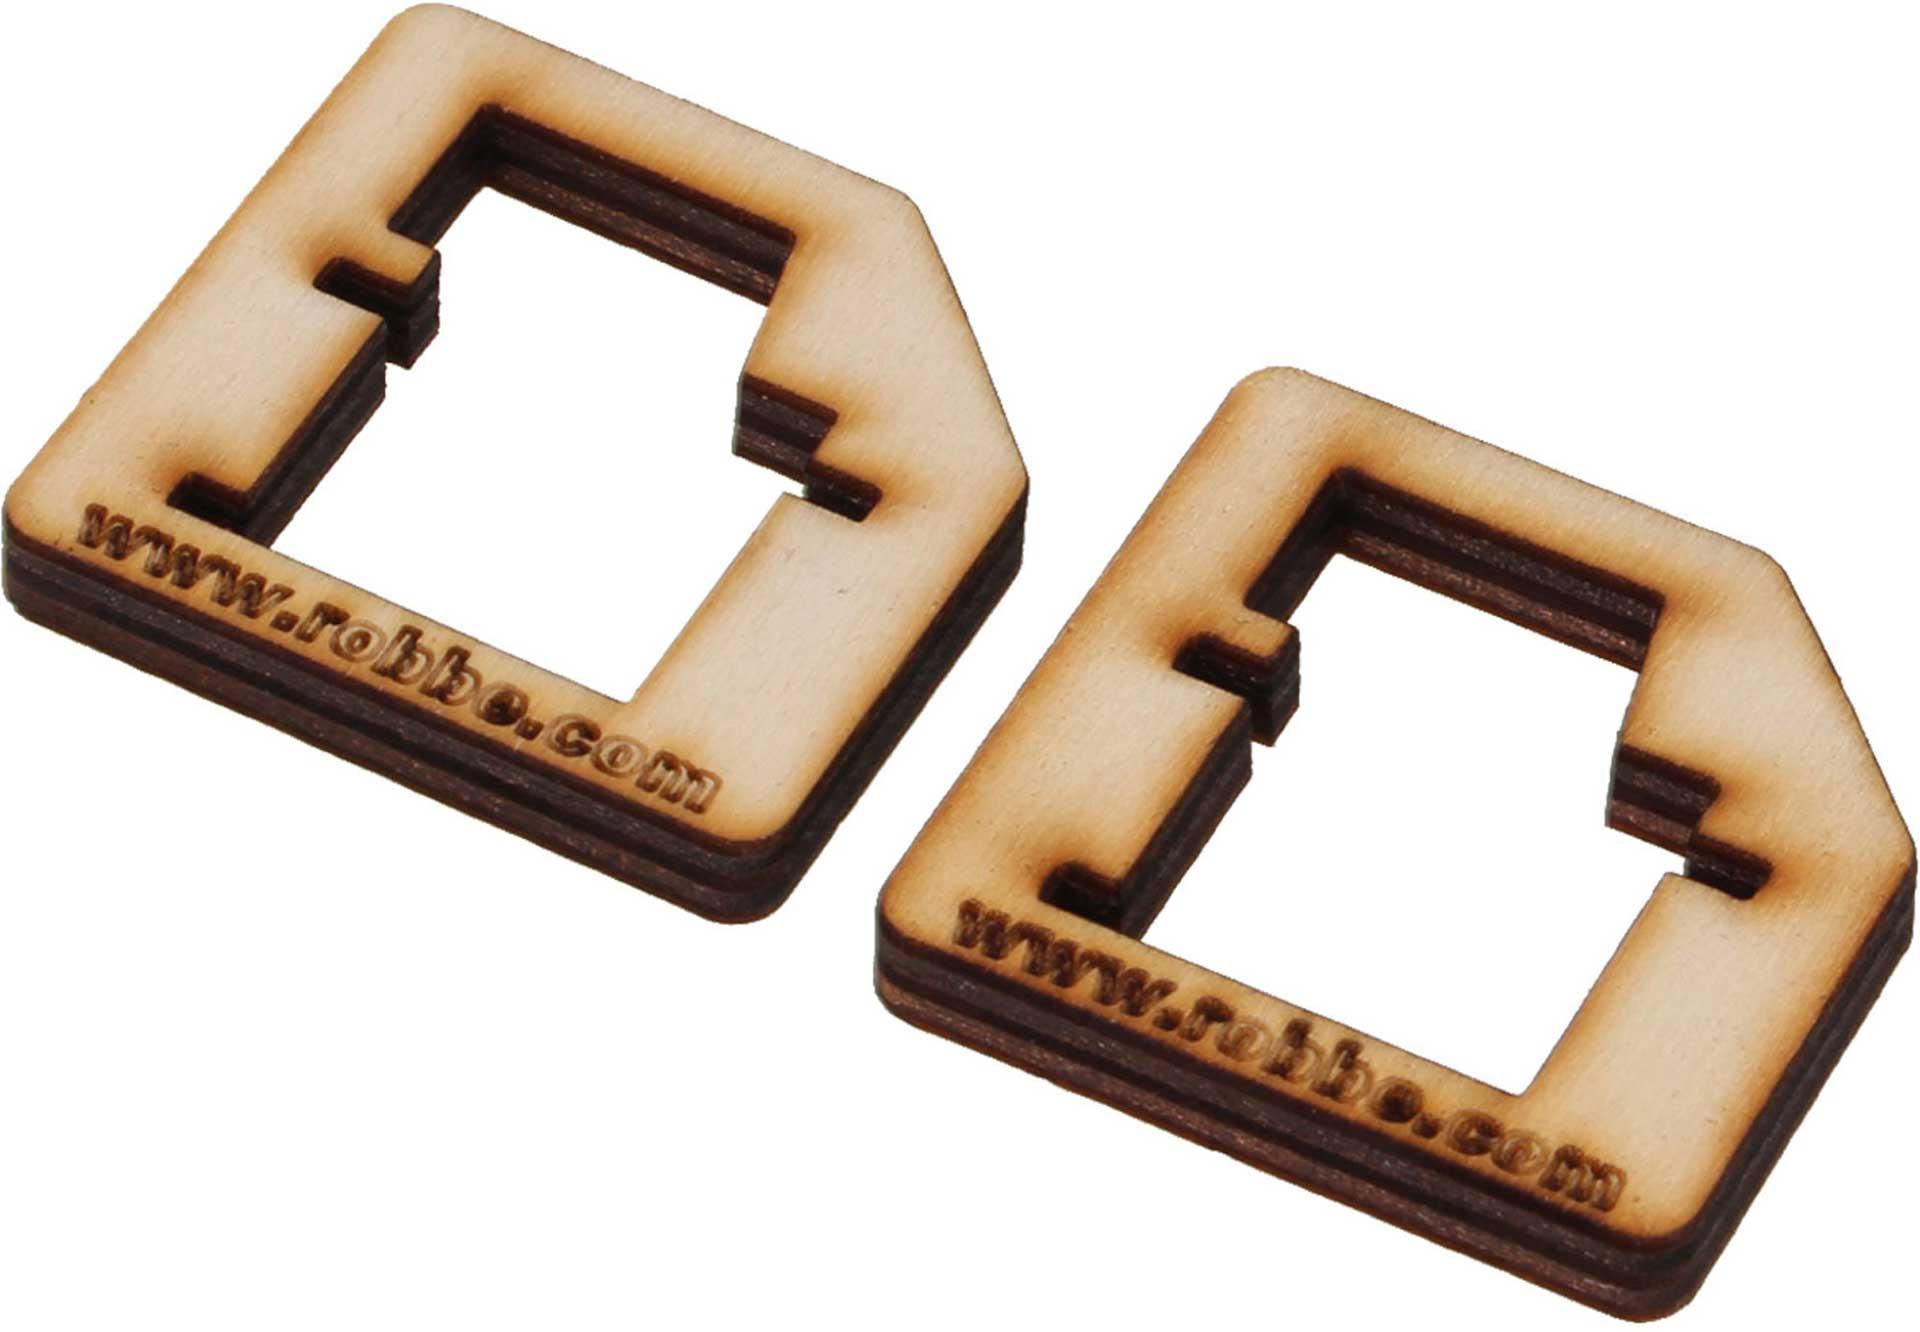 ROBBE CNC SERVORAHMEN FS 133 BB MG (1 PAAR)